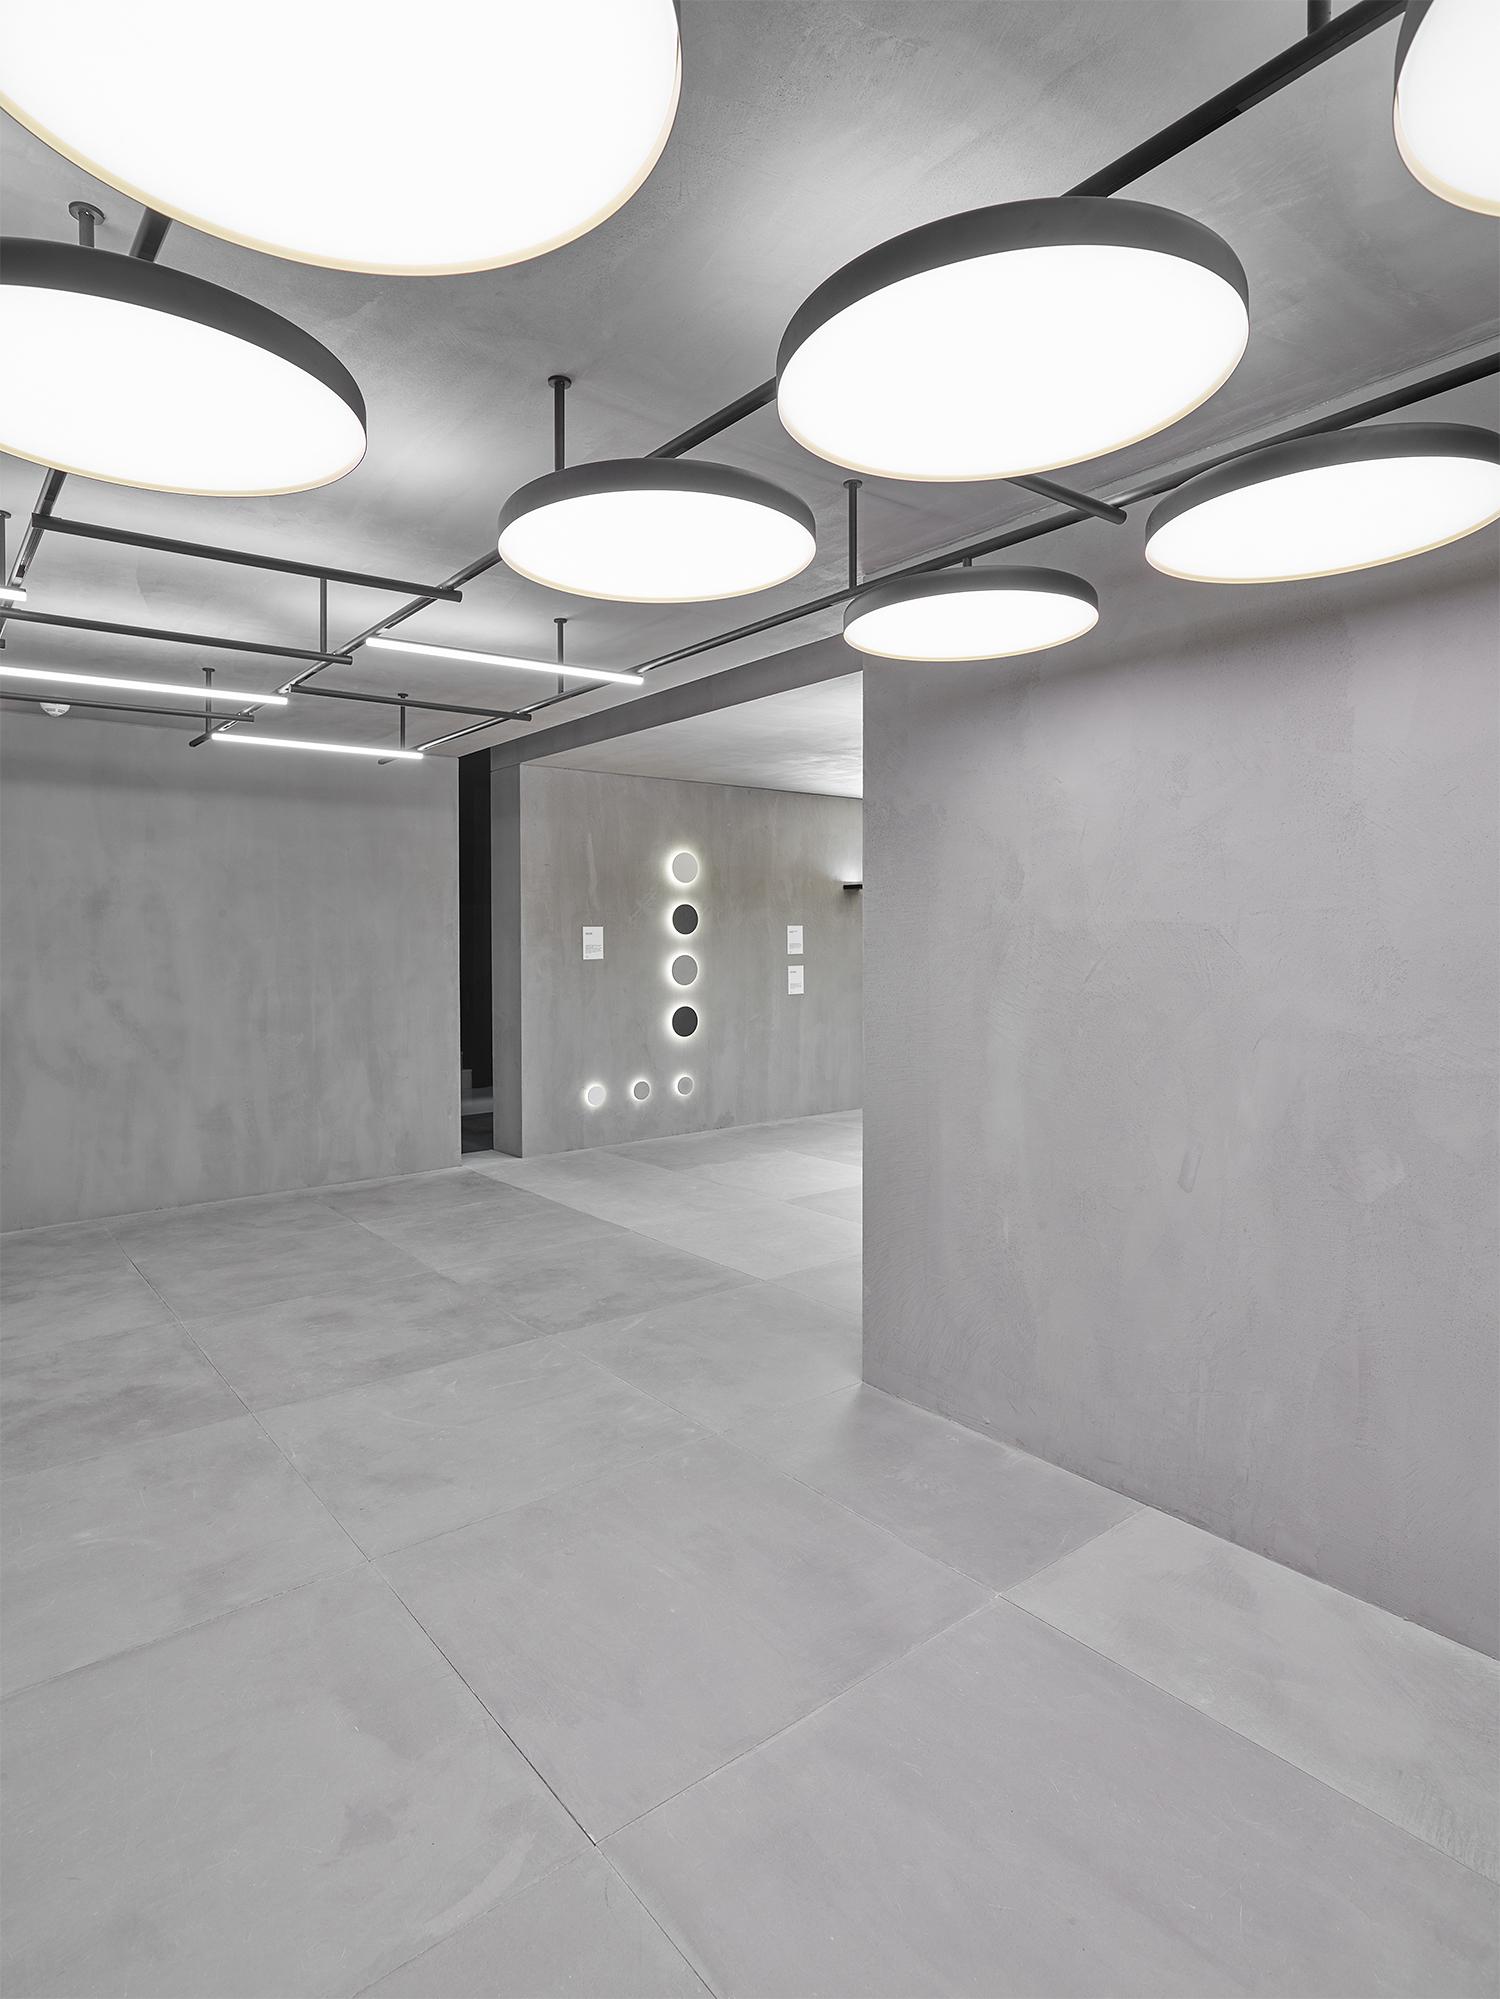 Vvda 2018 Flos Stand Light Building Frankfurt Credits C41 Studio 2